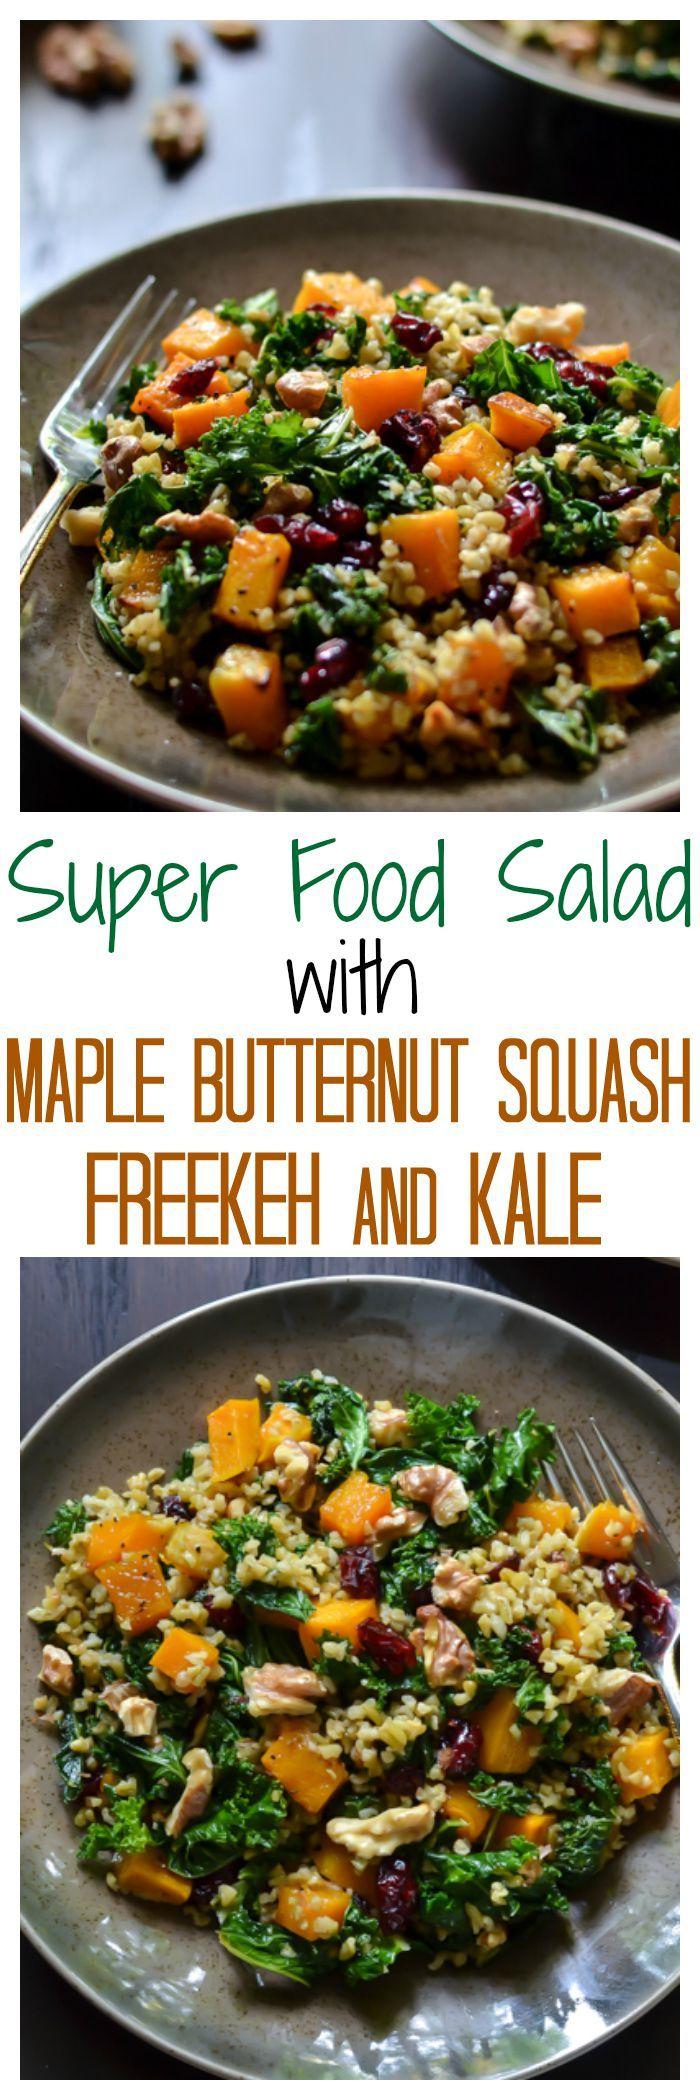 Maple Butternut Squash Freekeh Salad with Kale